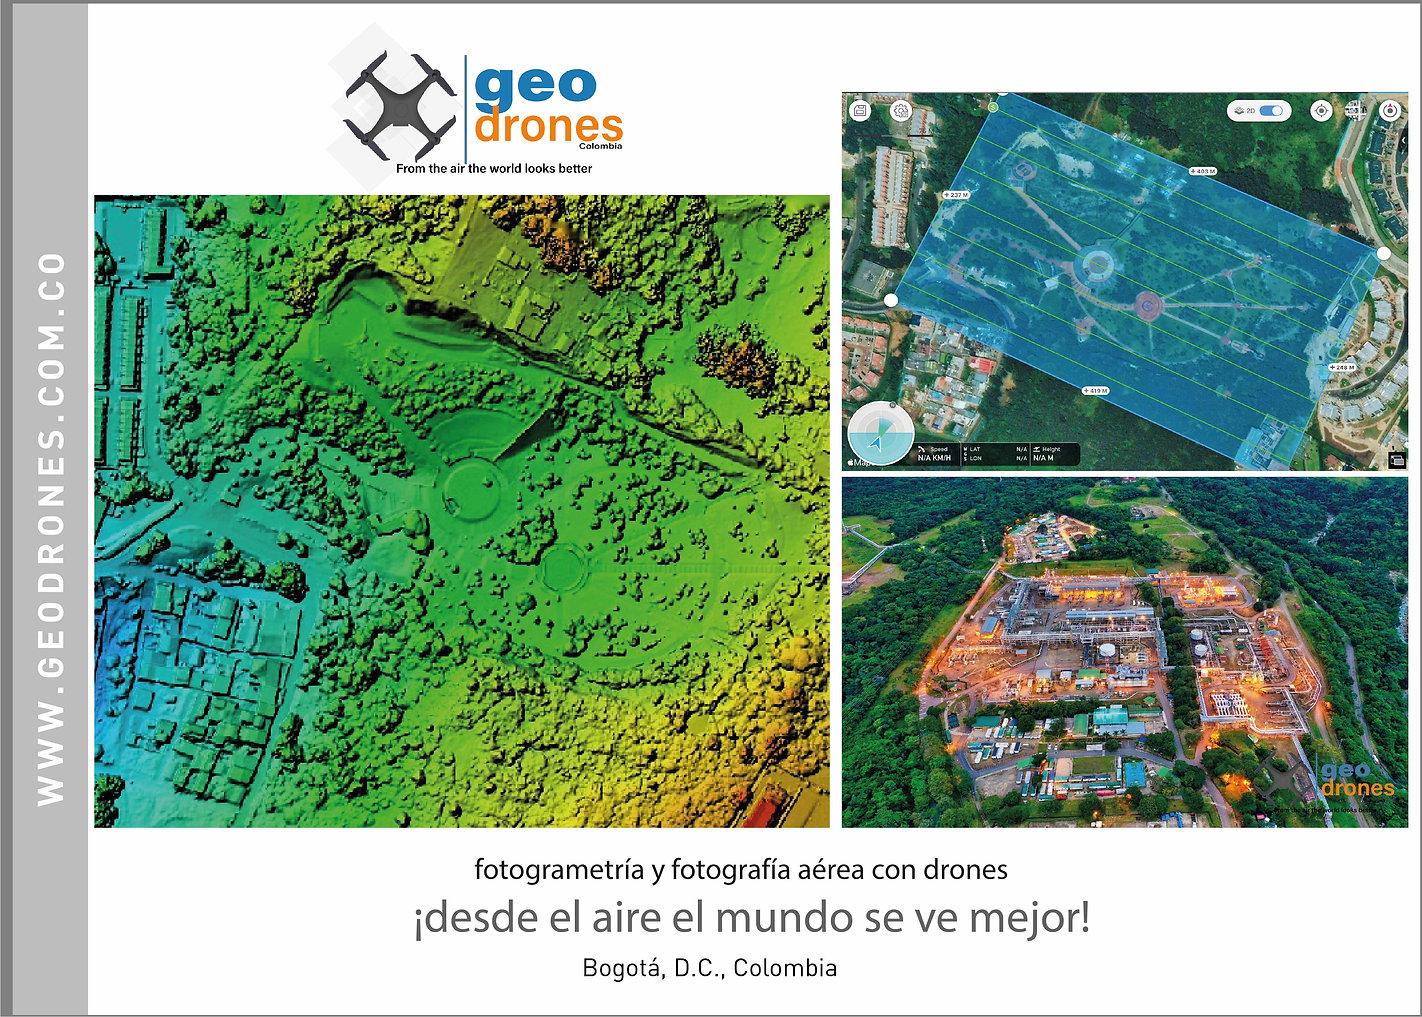 0. Brochure geodrones Colombia S.A.S.jpg